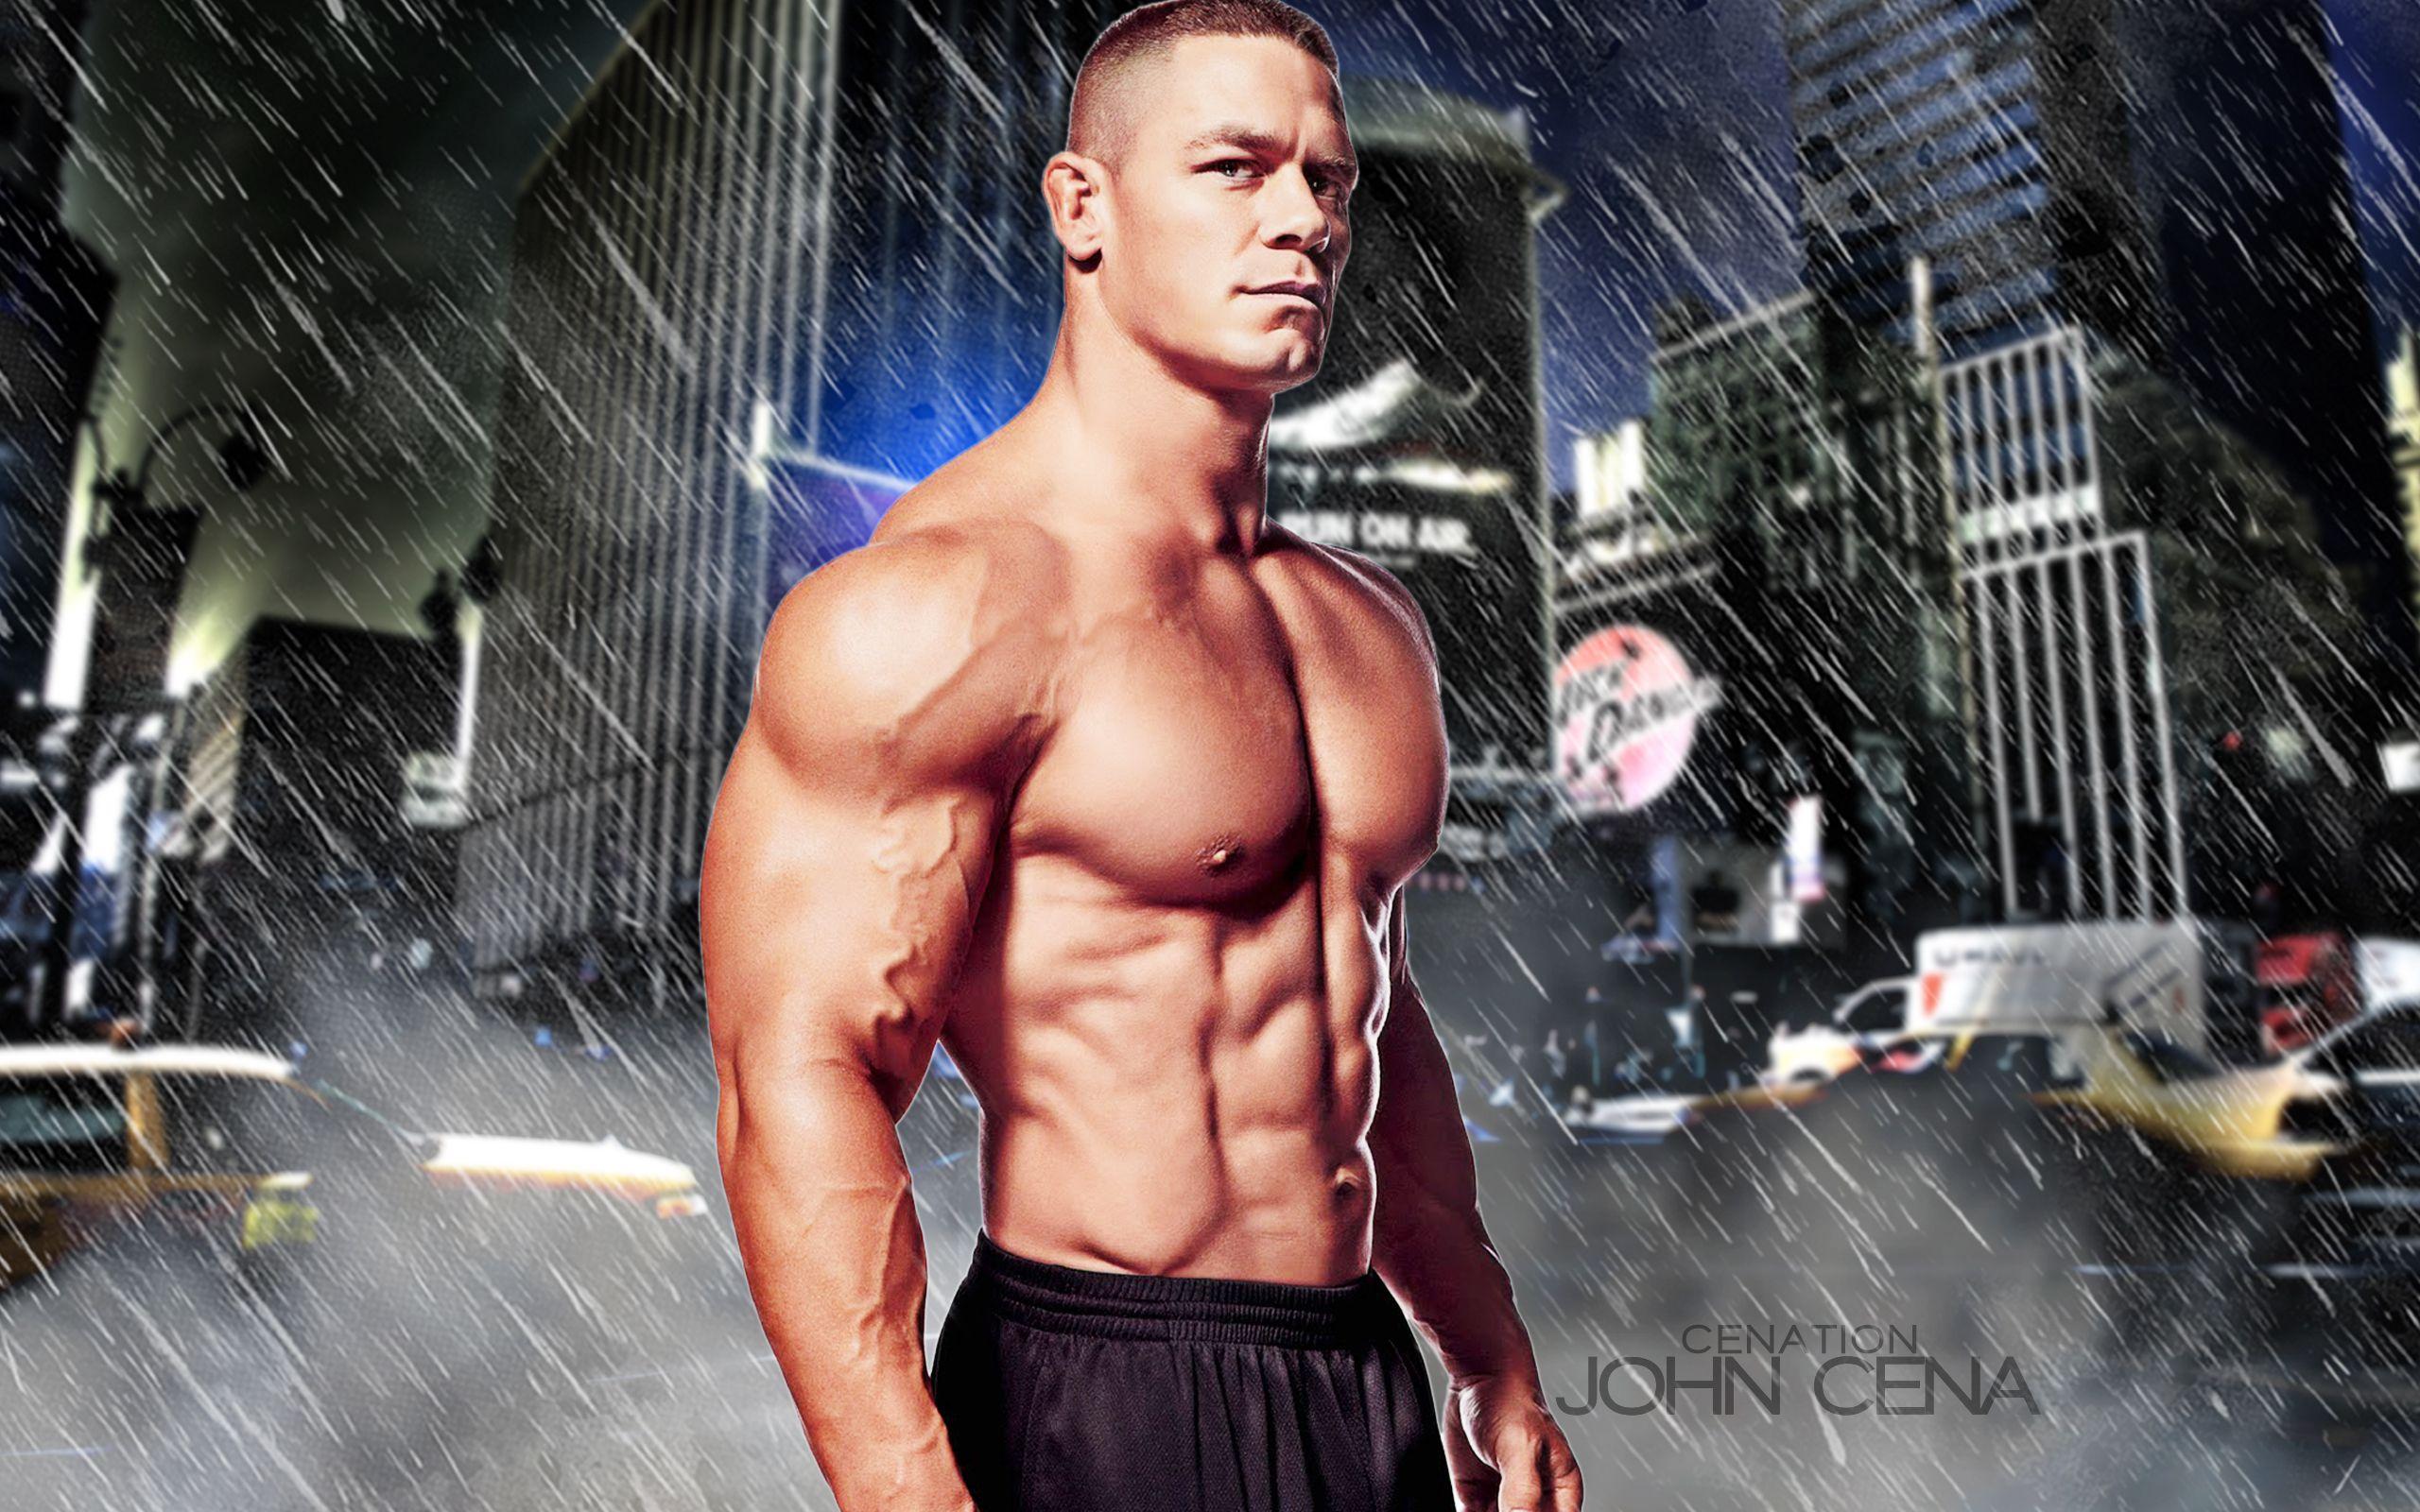 WWE John Cena | WWE Wallpapers Work | Wwe wallpapers, John ...